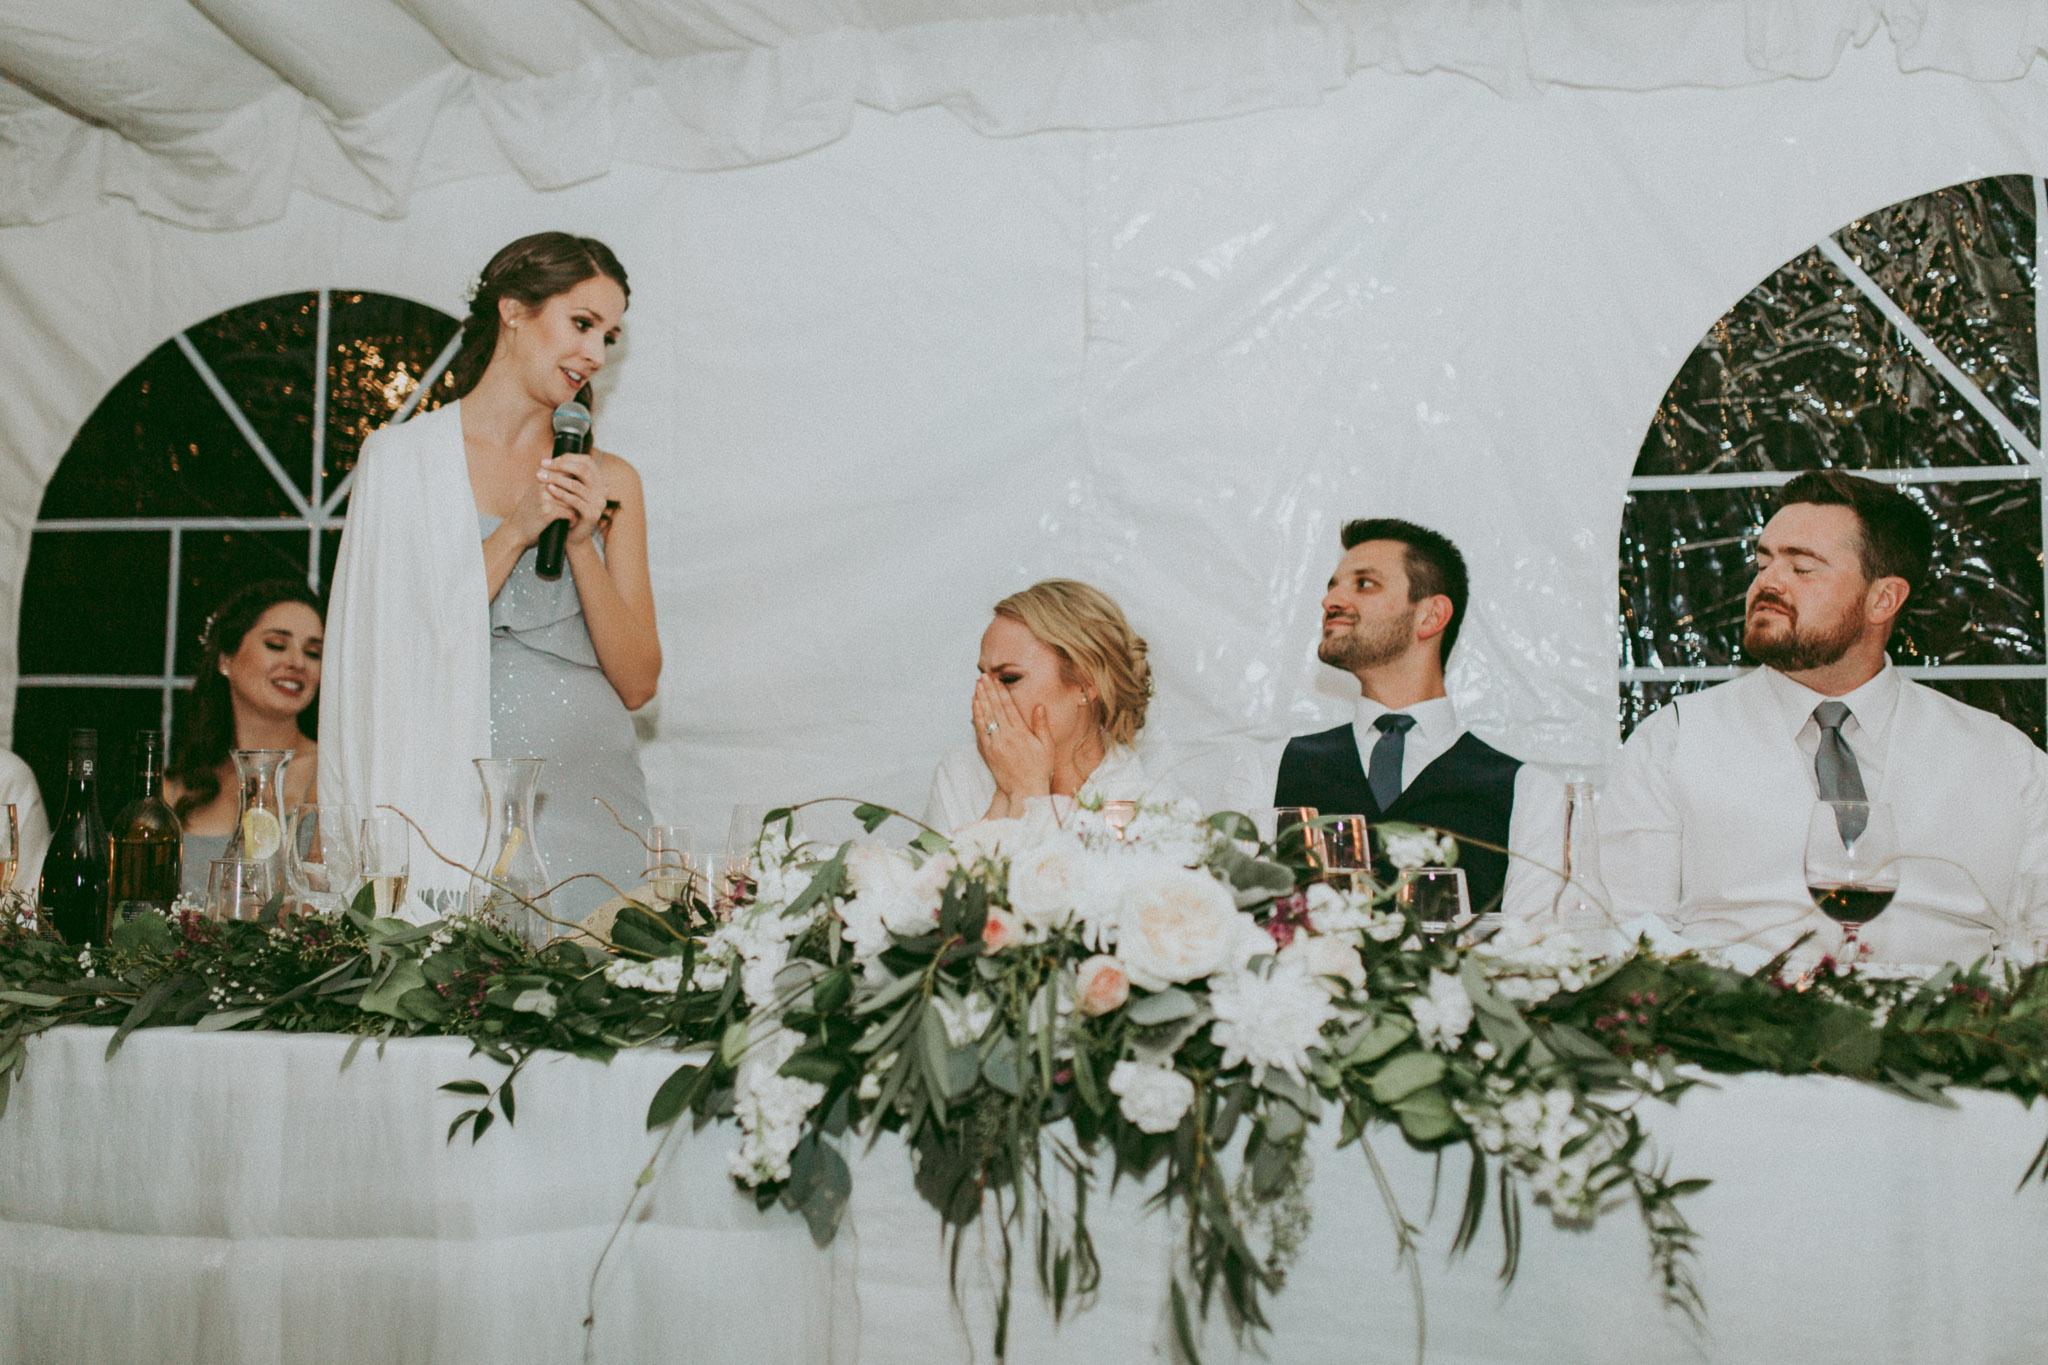 Durali Villa Wedding - Reception in the tent